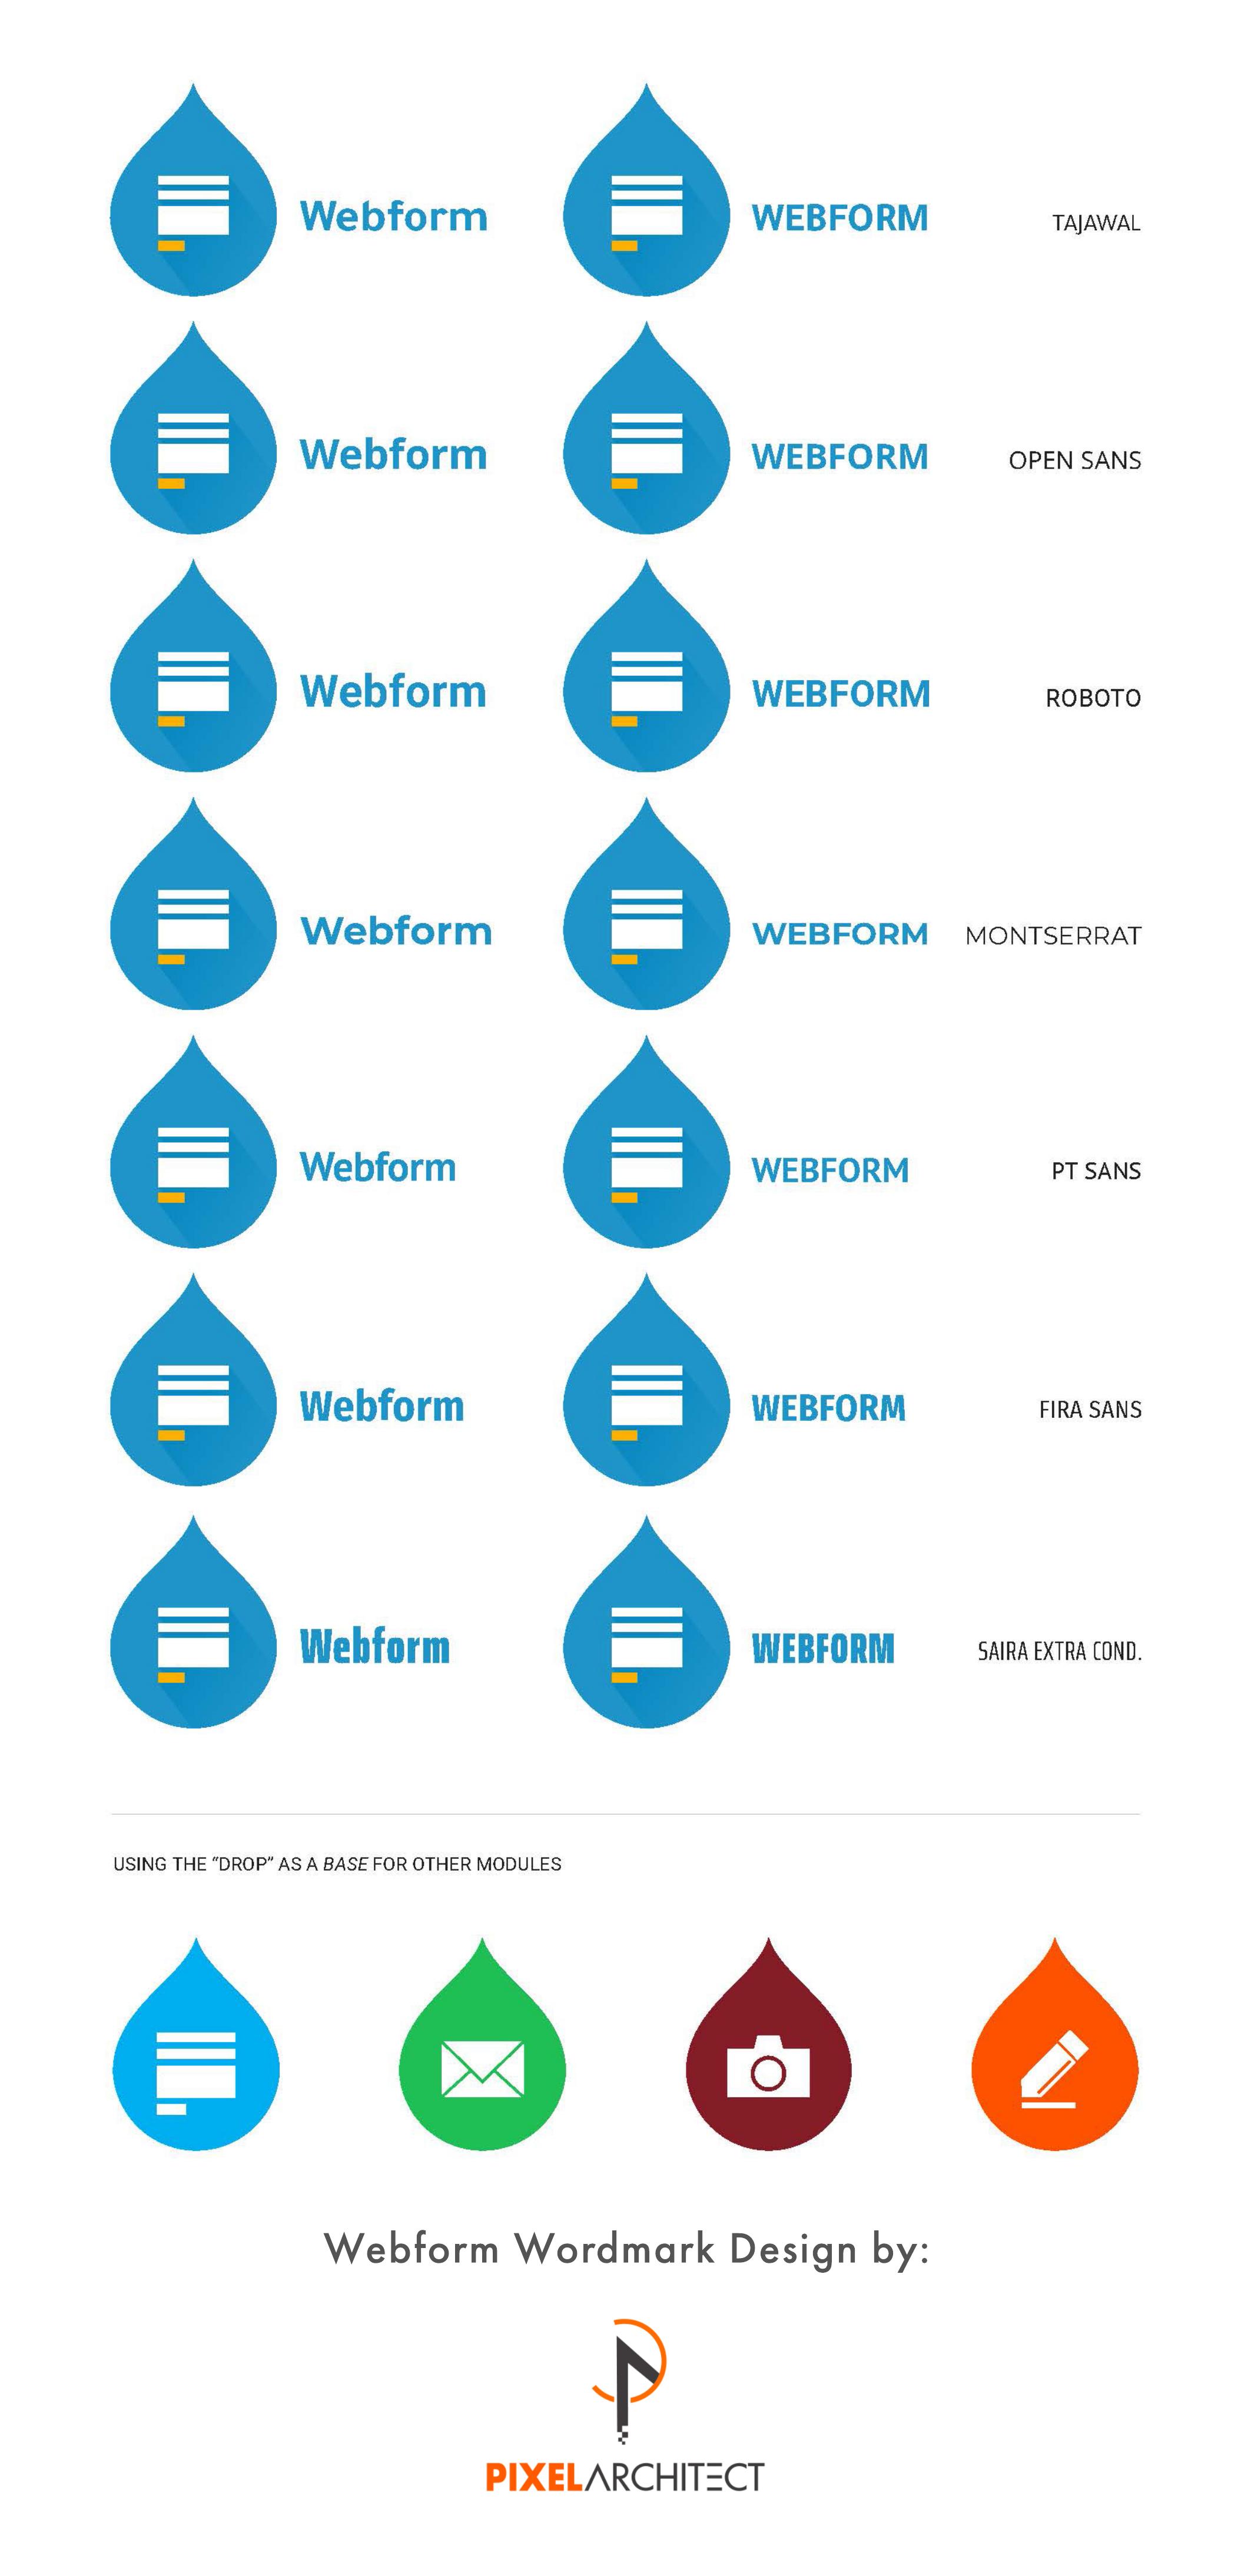 Create a logo and header for the Webform module [#3026111